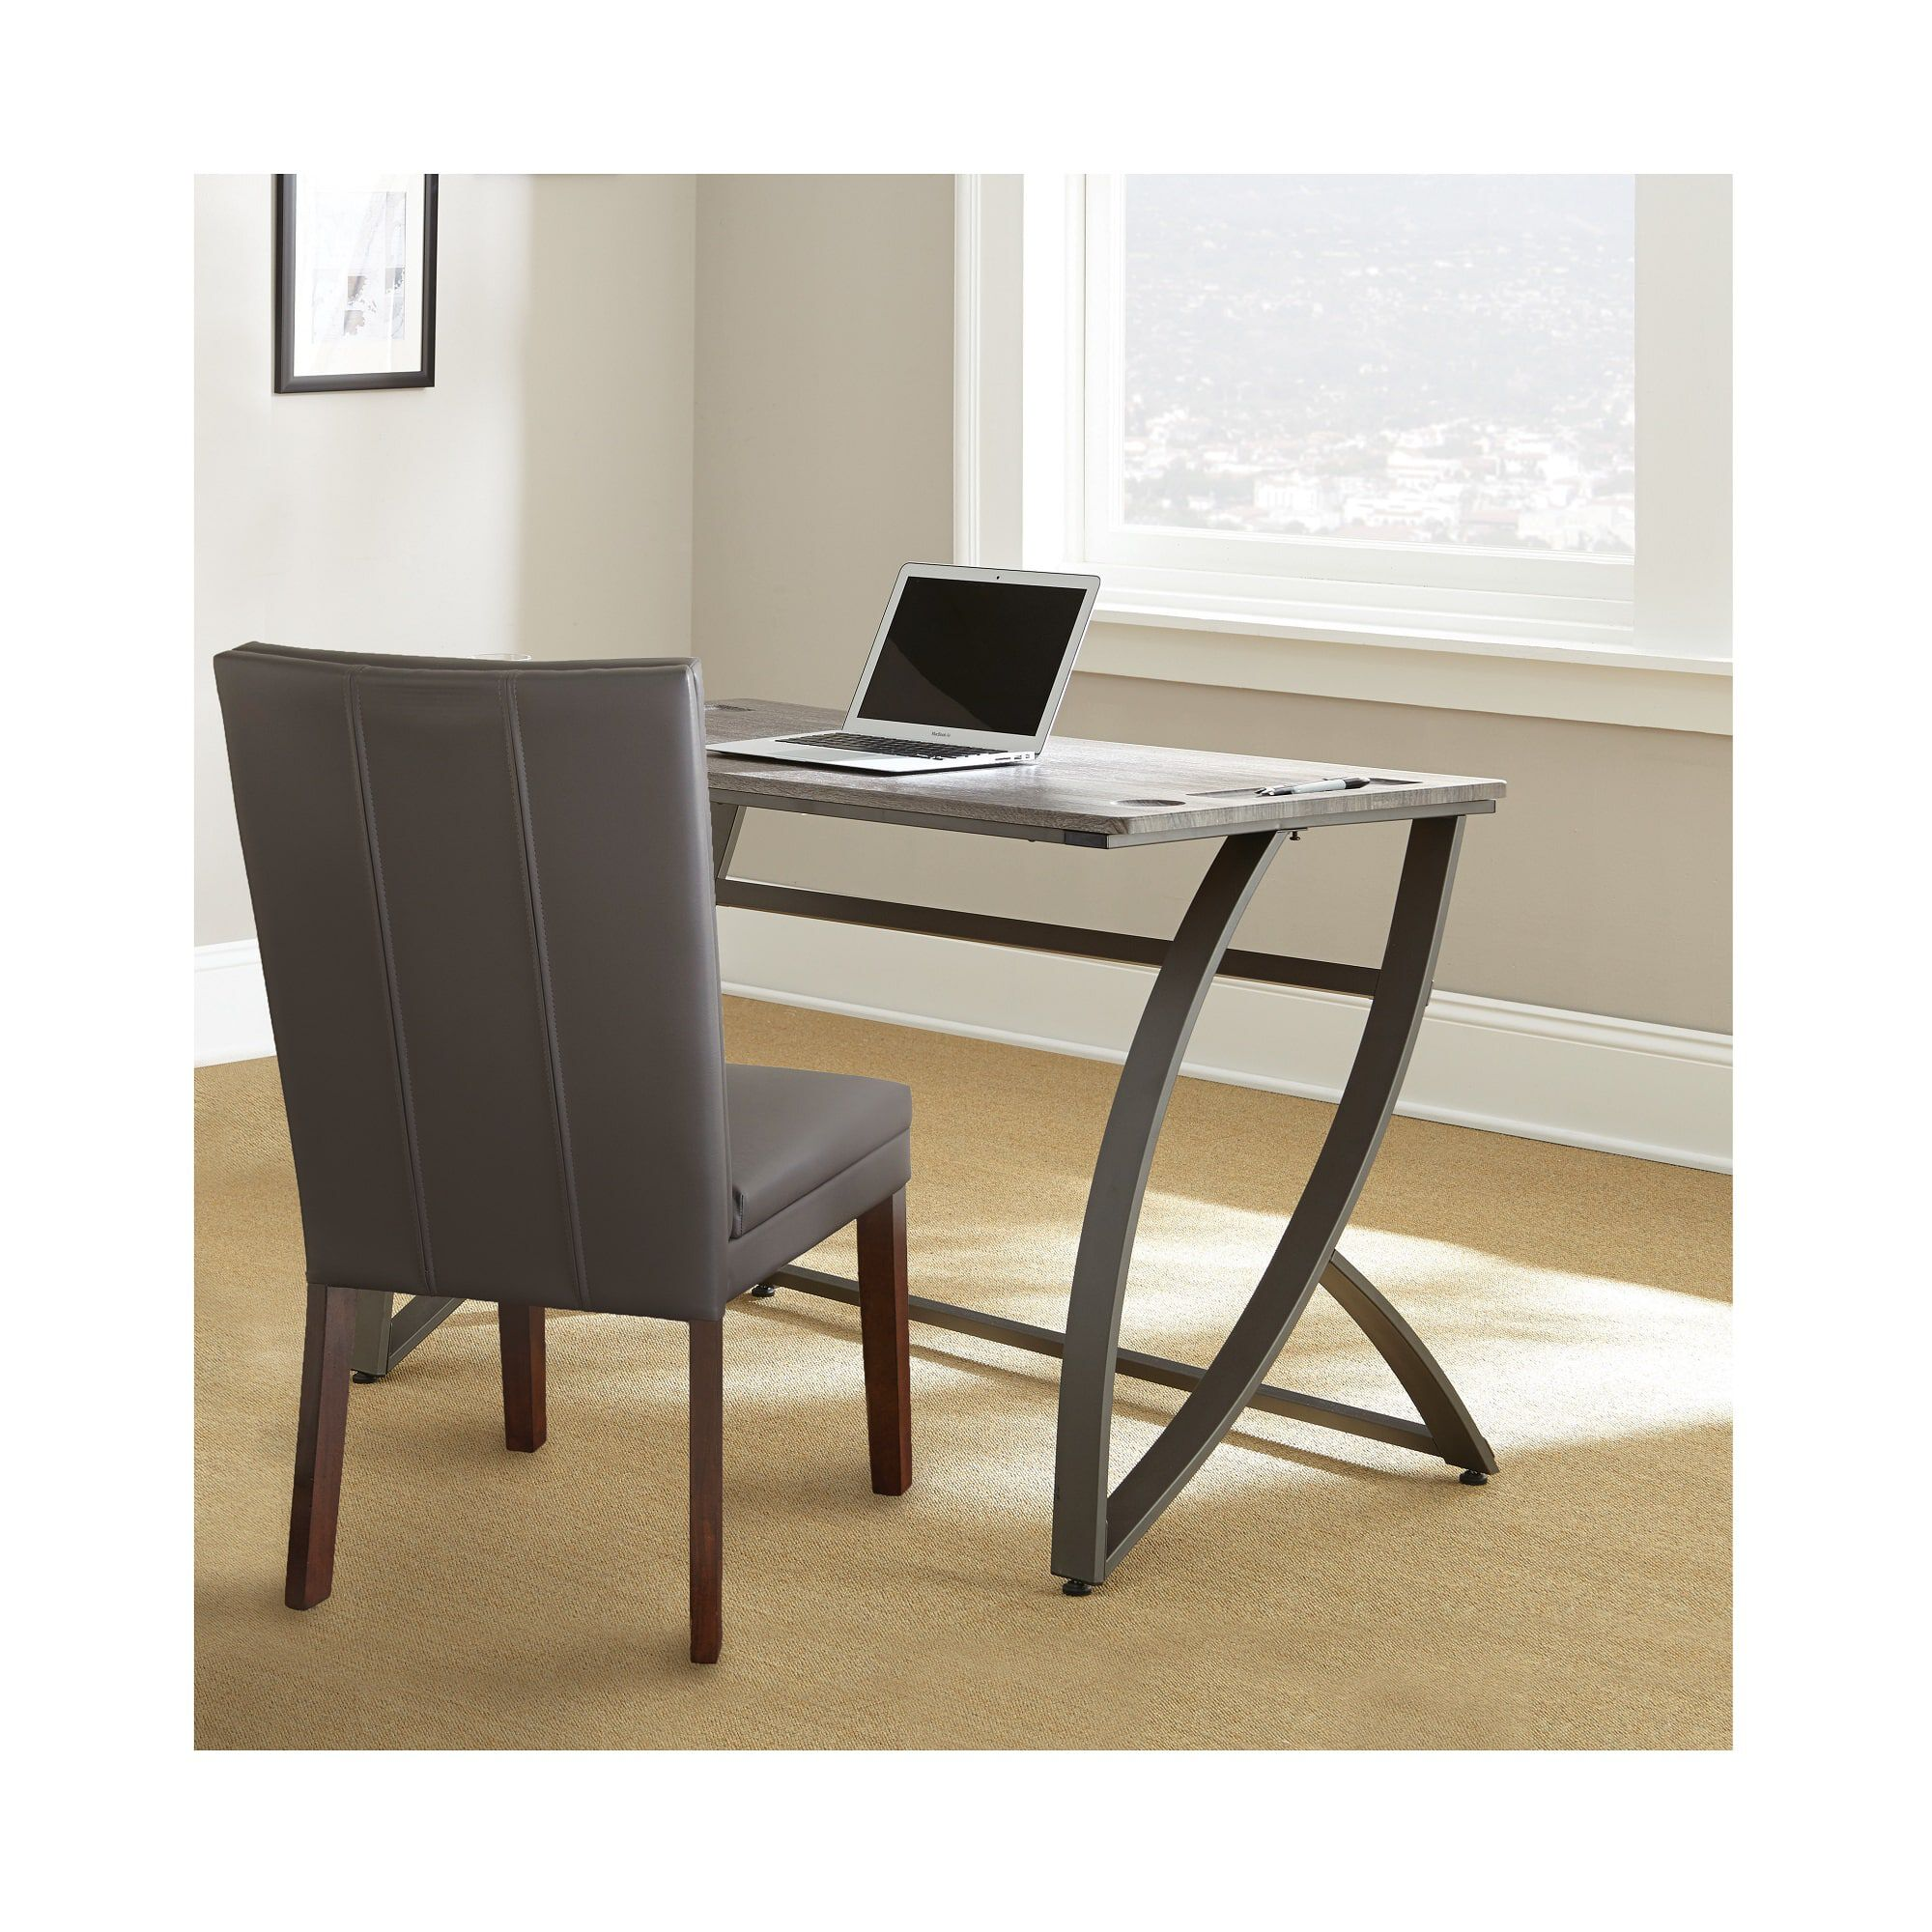 Steve Silver Furniture 2 Piece Hatfield Desk And Chair Set